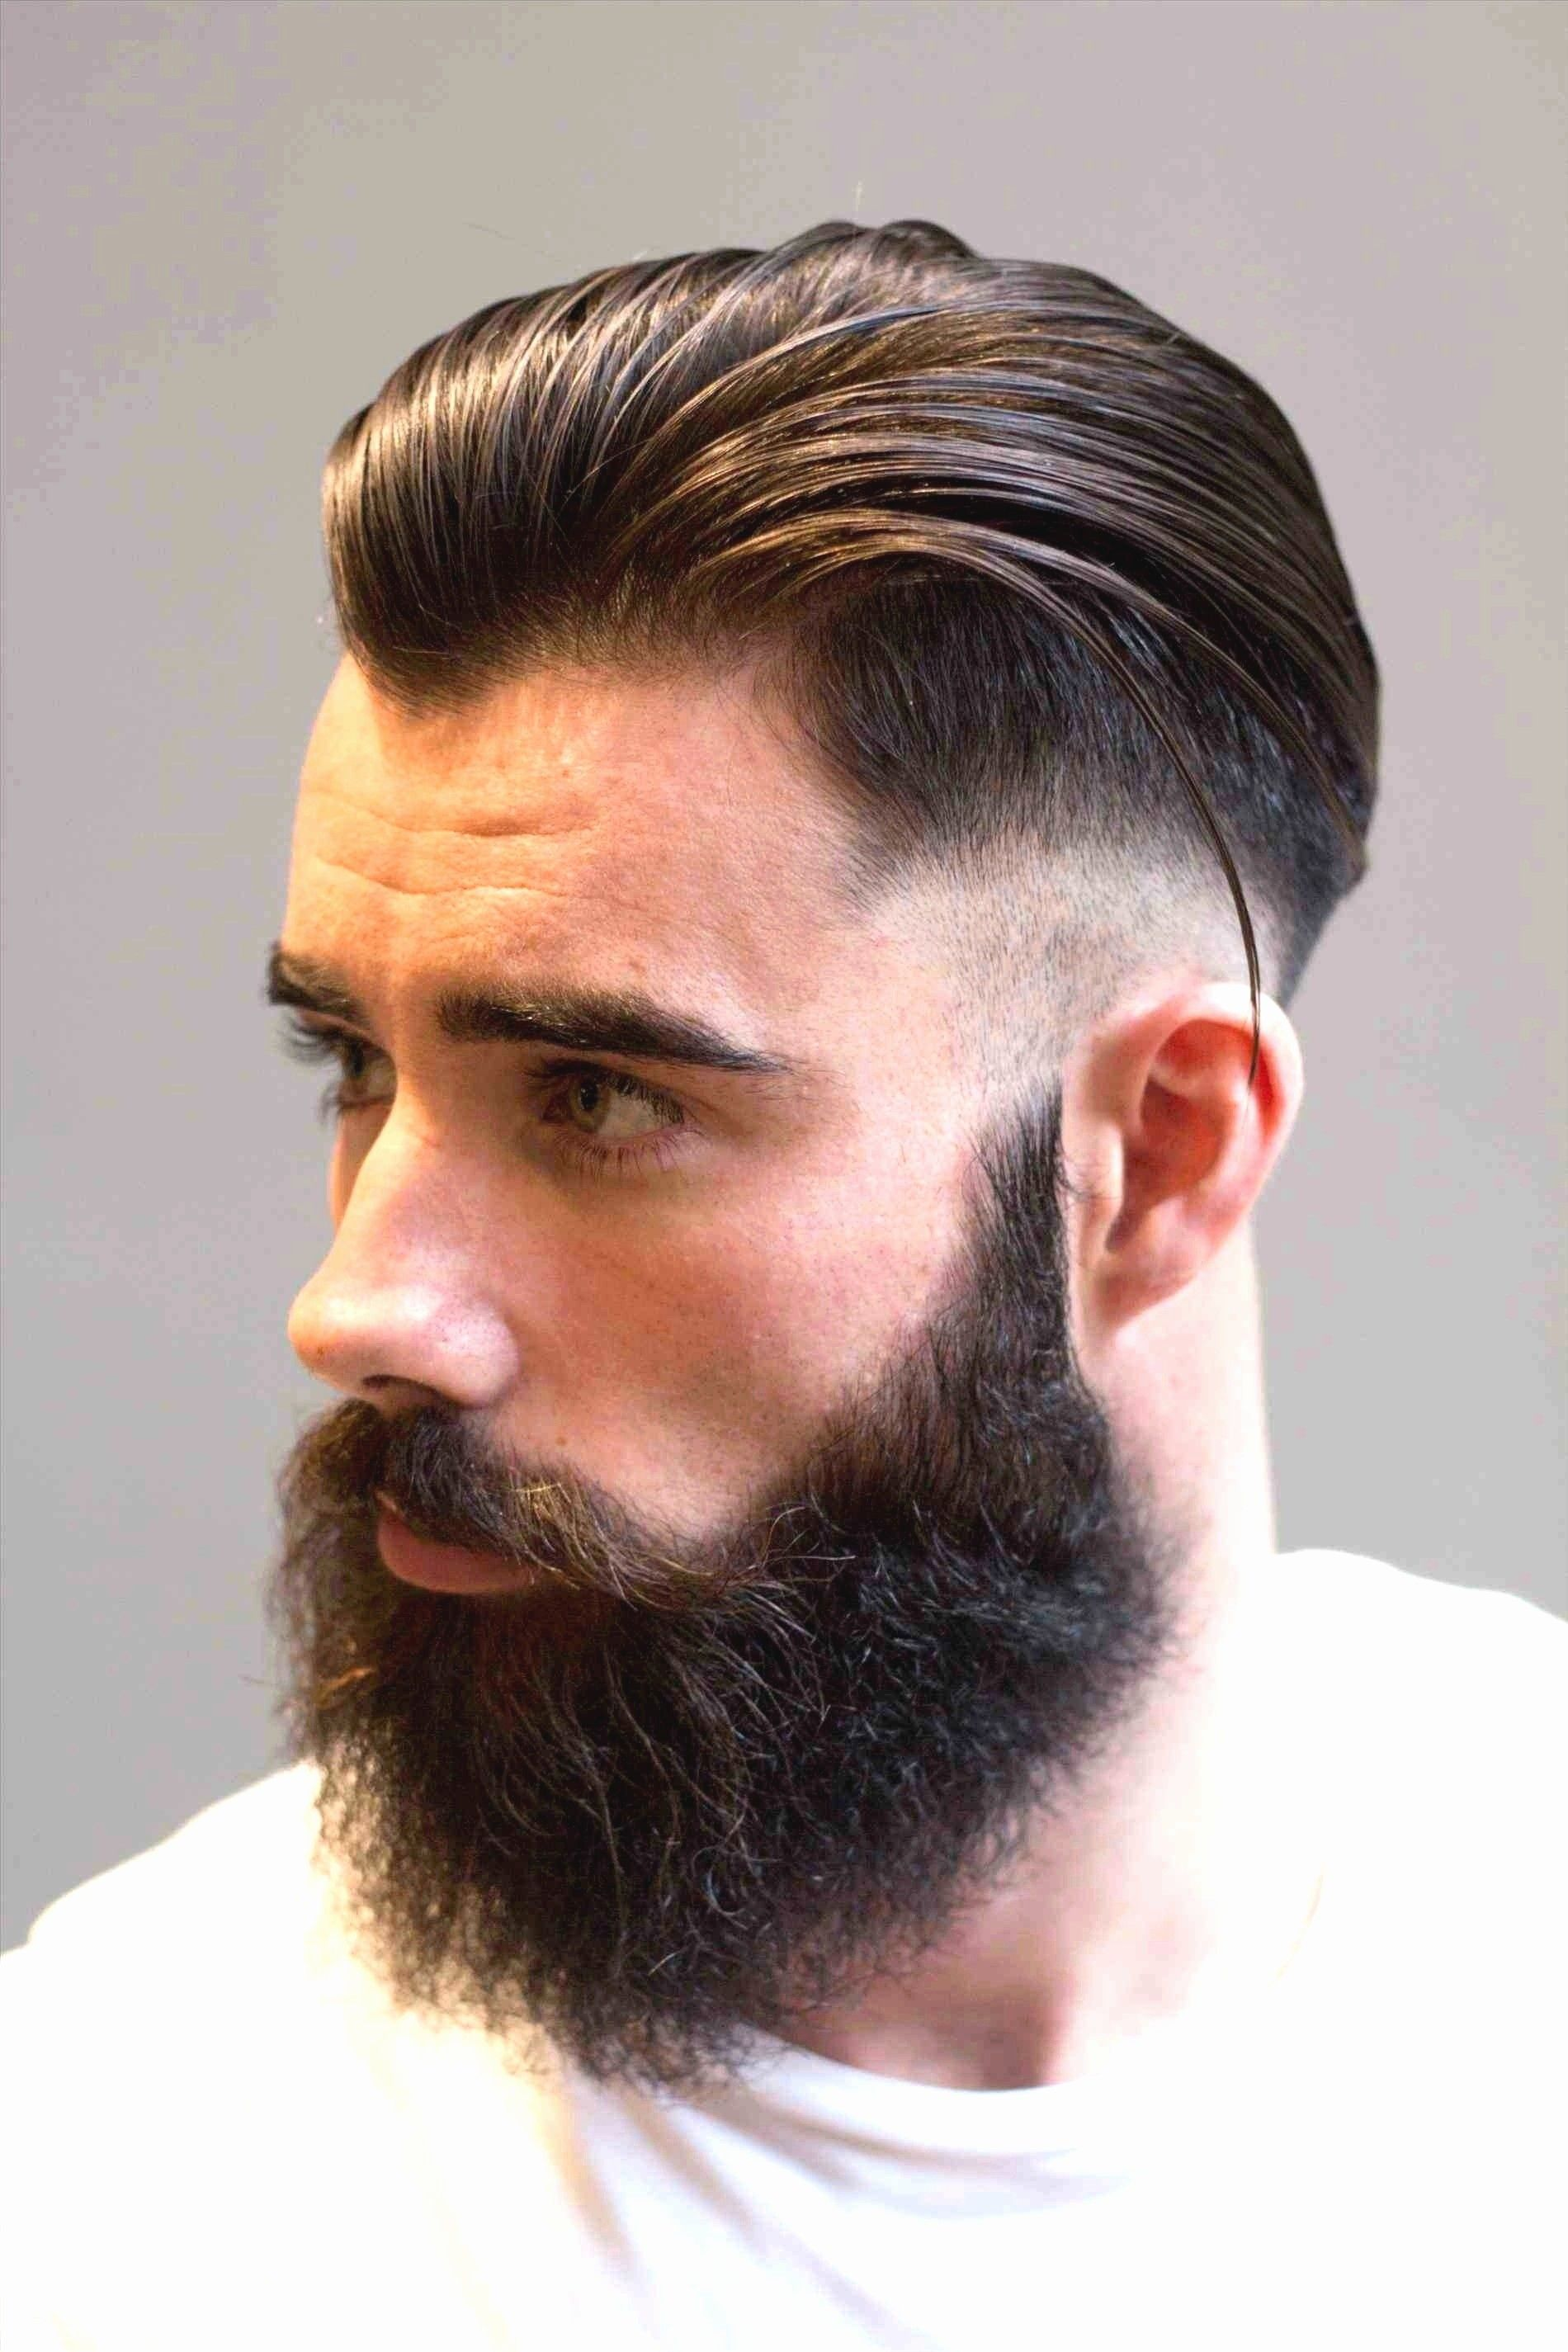 40 year old mens hairstyles 2018 | hair inspiration | beard